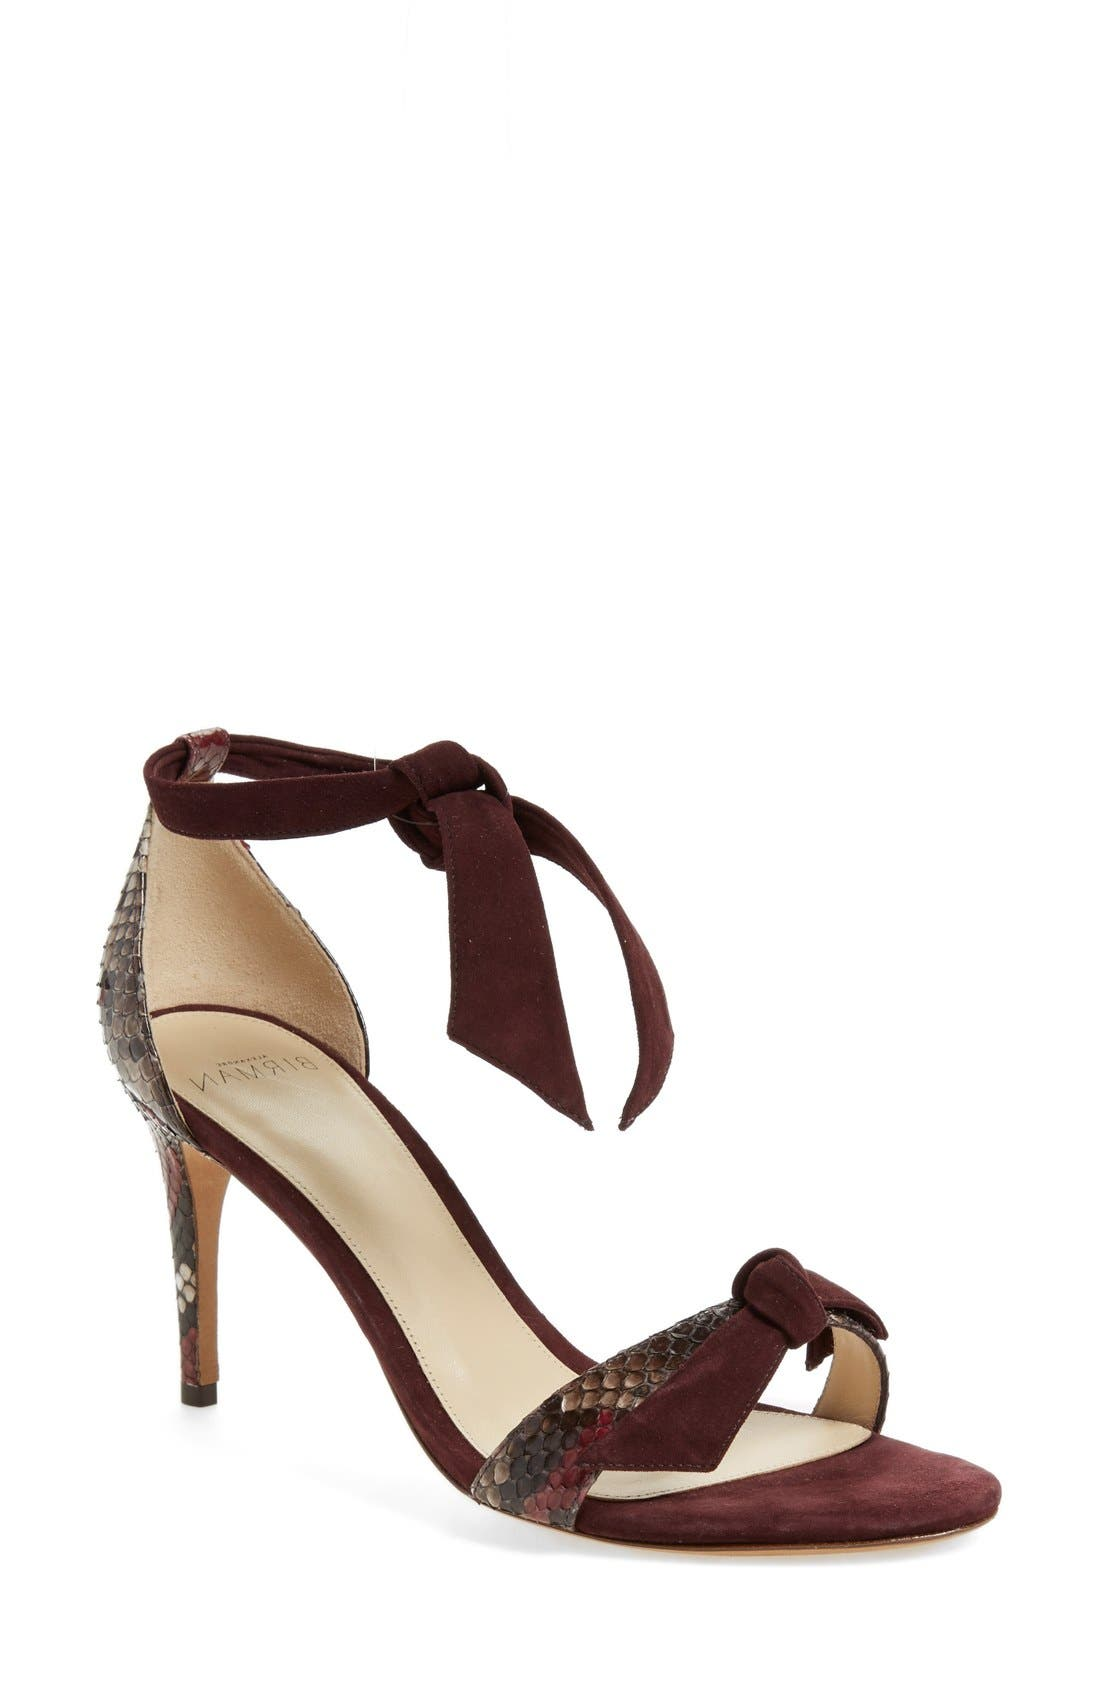 'Clarita' Suede & Genuine Python Ankle Tie Sandal,                             Main thumbnail 1, color,                             930